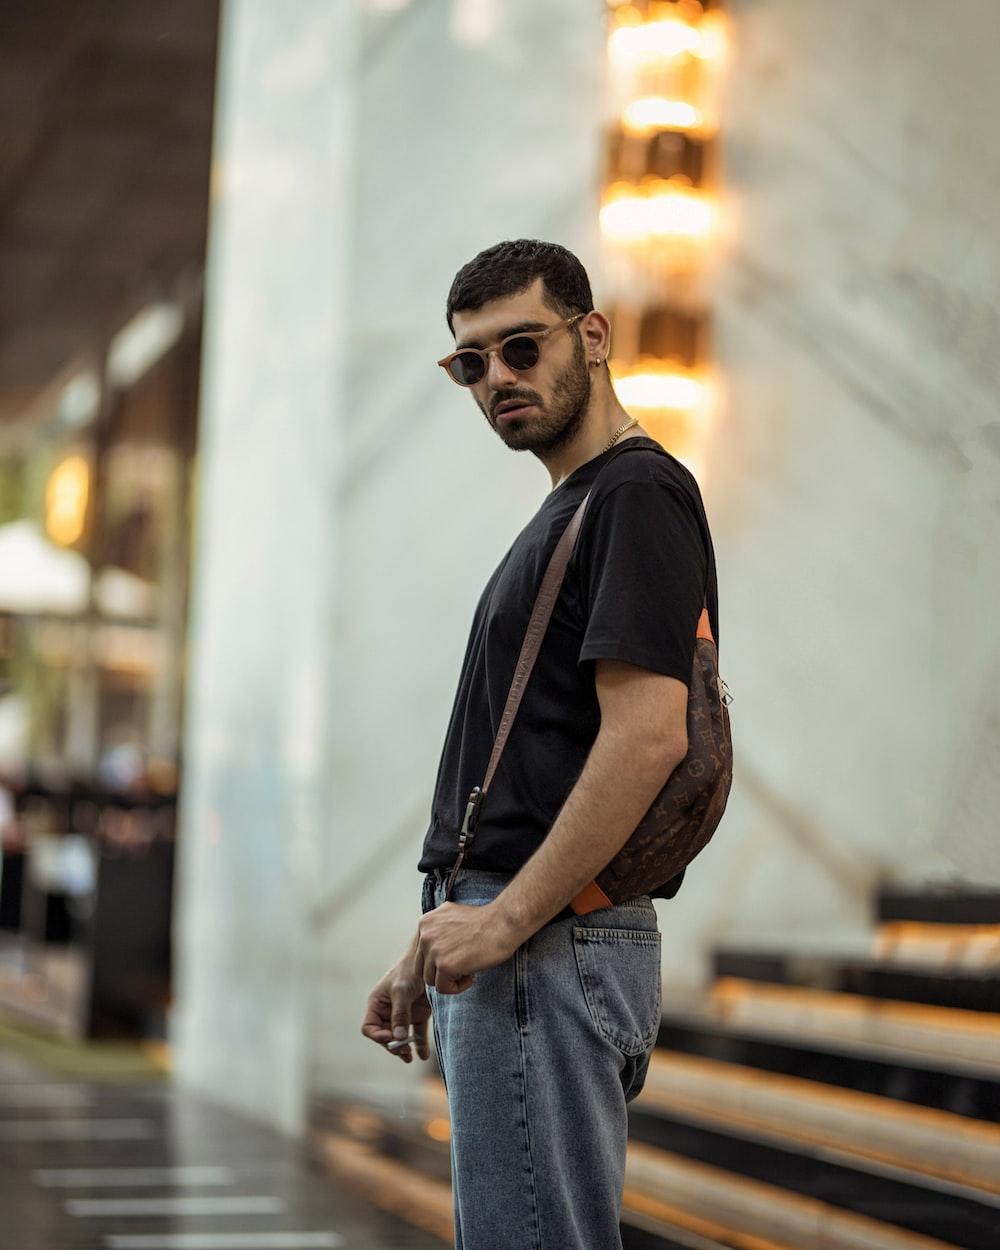 man in black crew neck t-shirt and blue denim jeans wearing black sunglasses